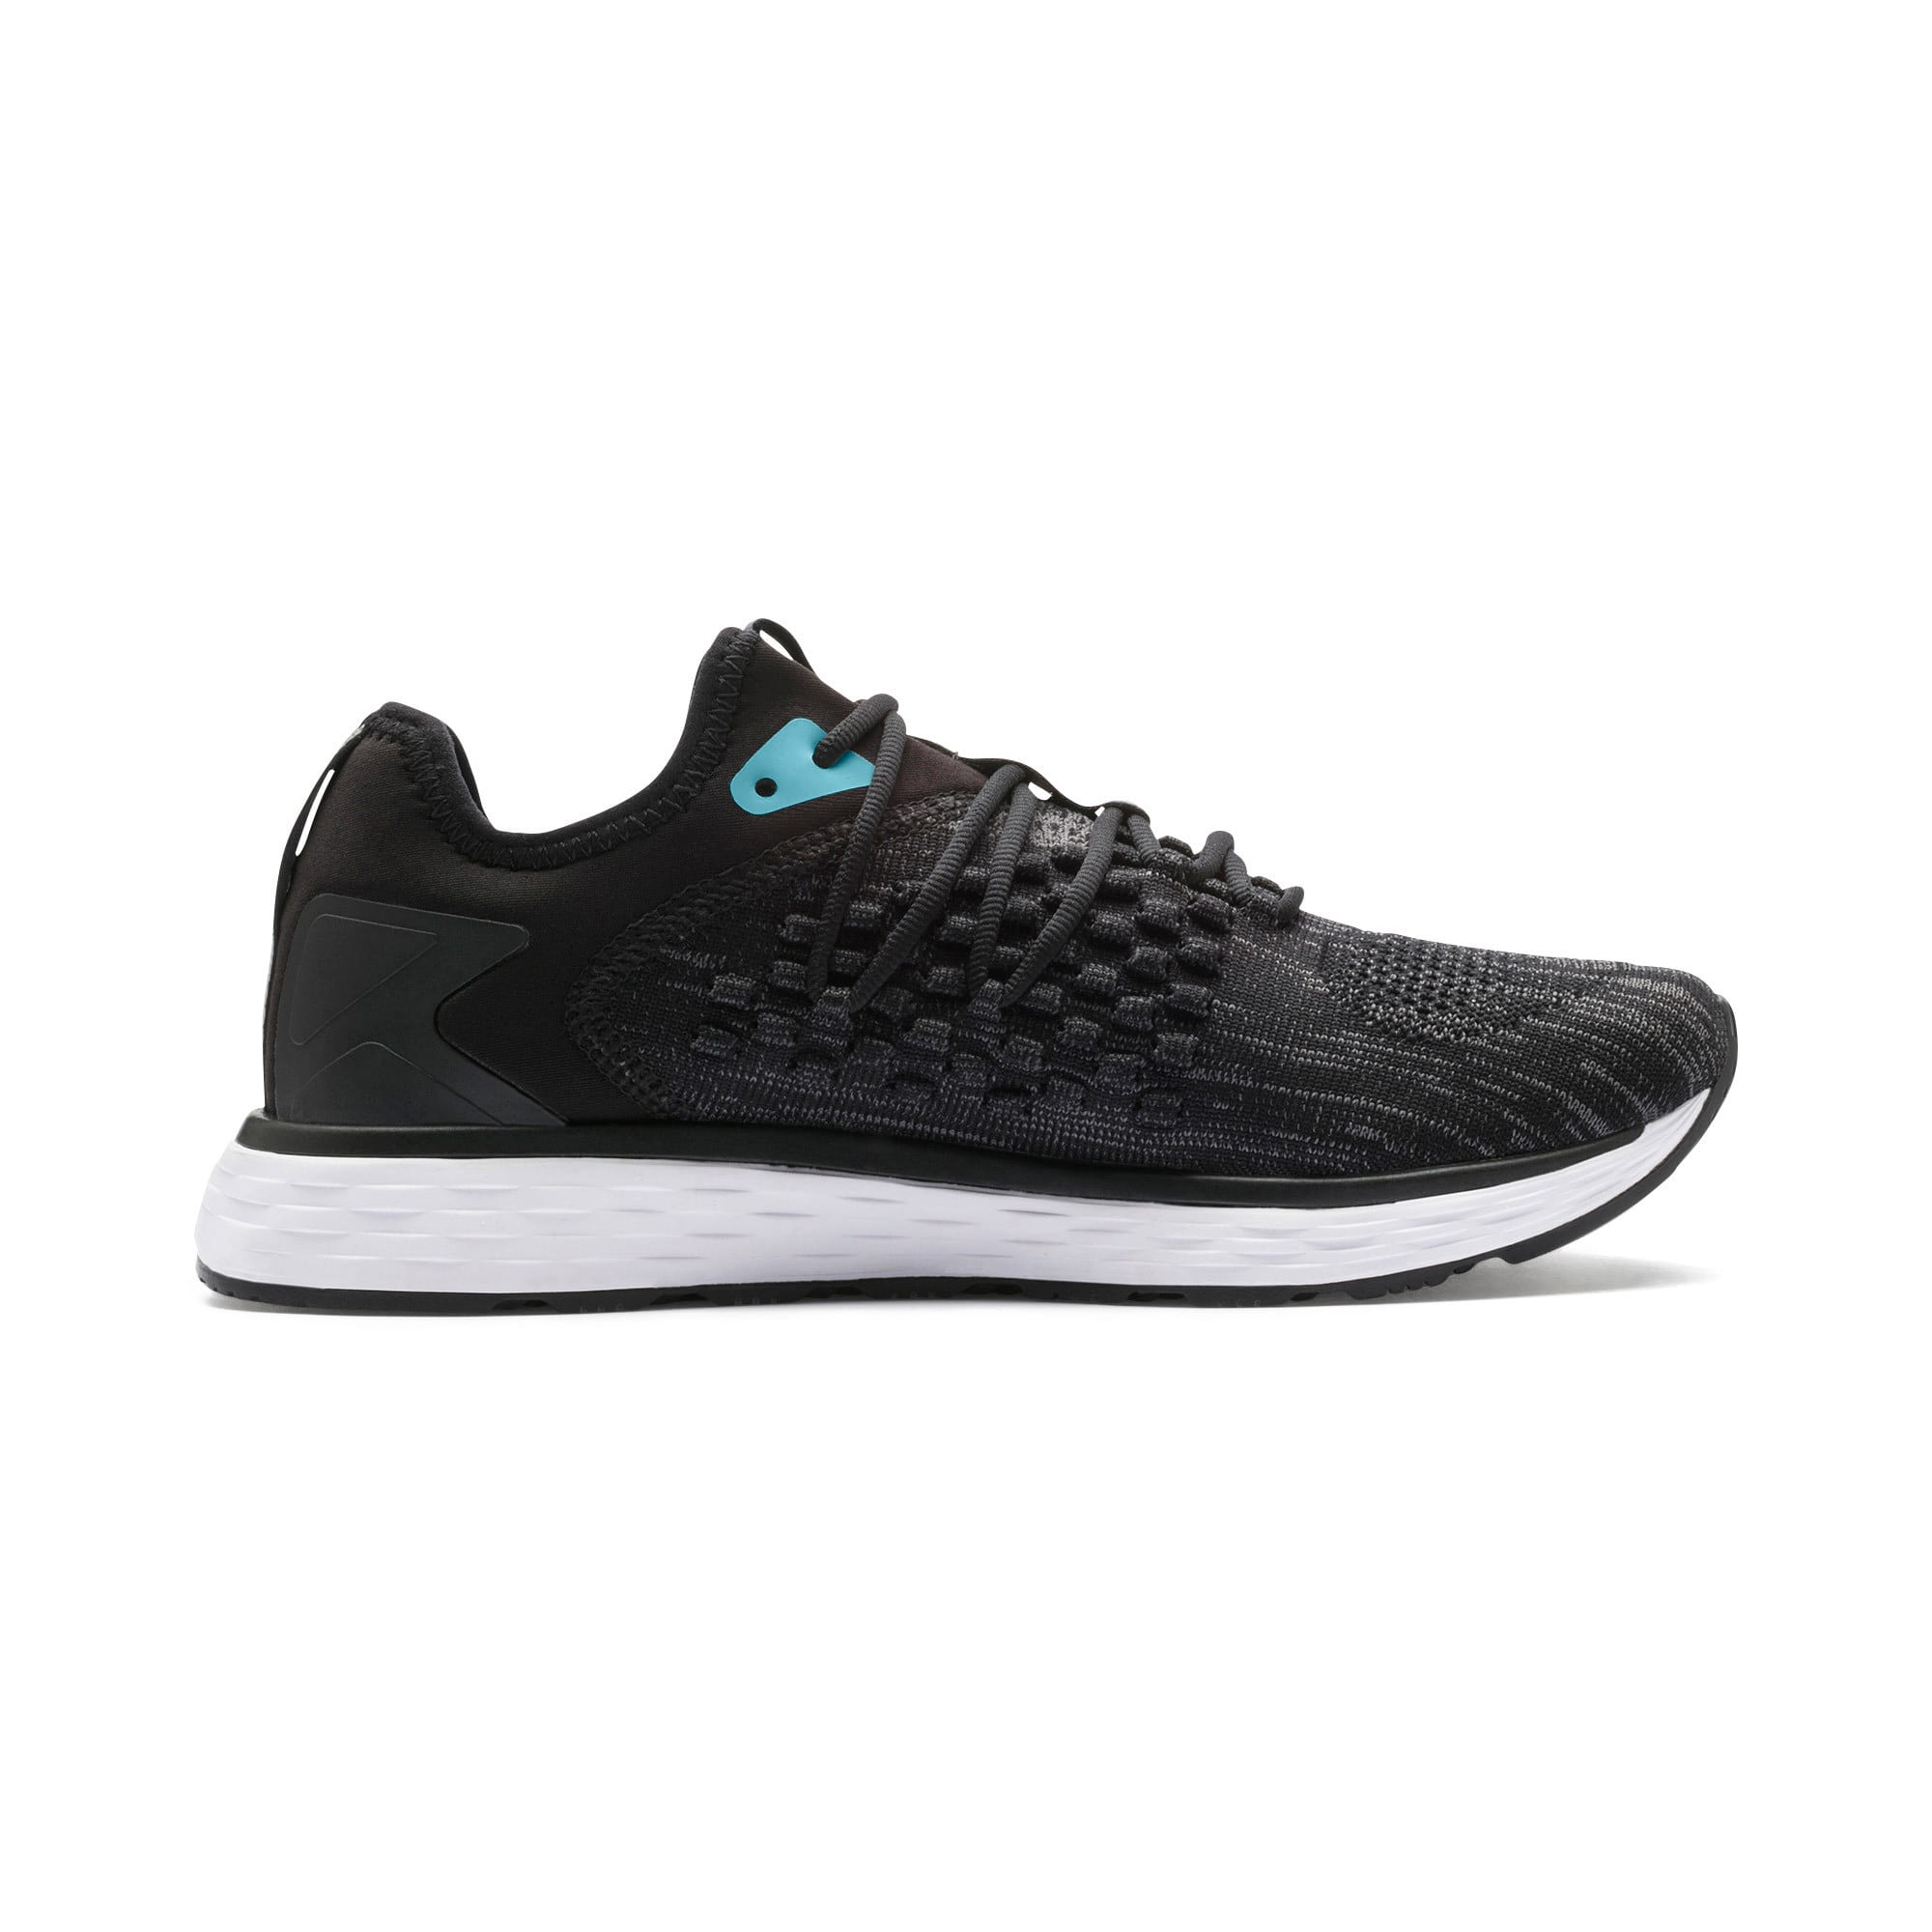 Thumbnail 6 of SPEED 600 FUSEFIT Women's Running Shoes, Puma Black-Milky Blue, medium